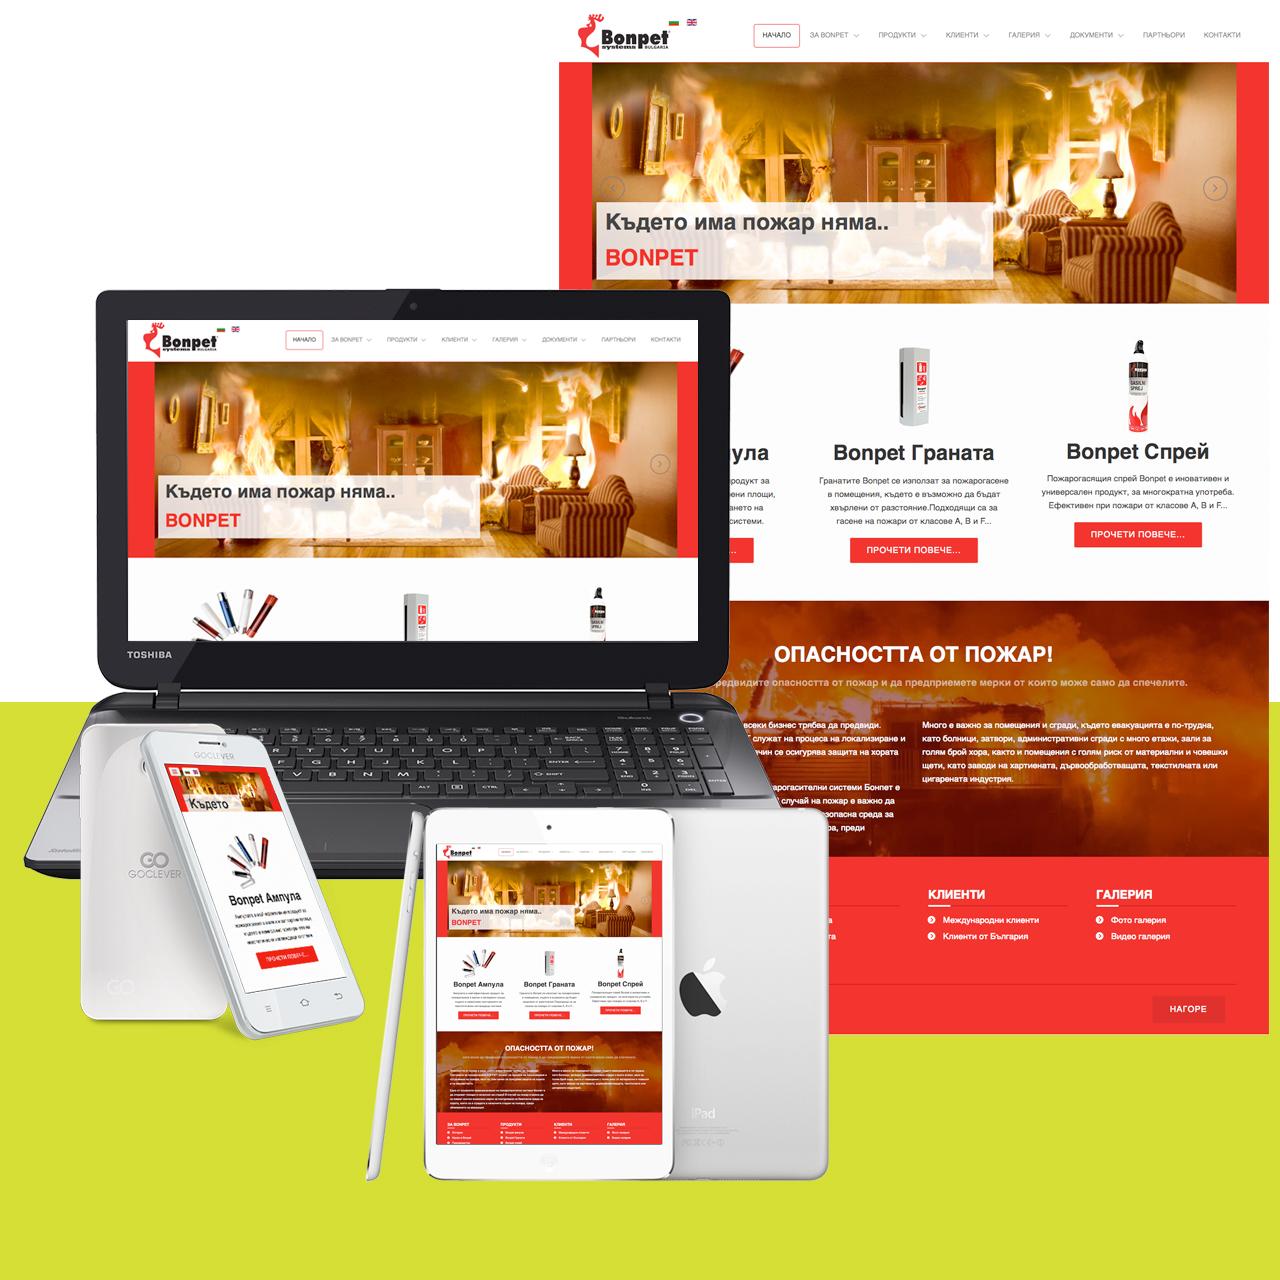 Bonpet.bg - дизайн на уебсайт